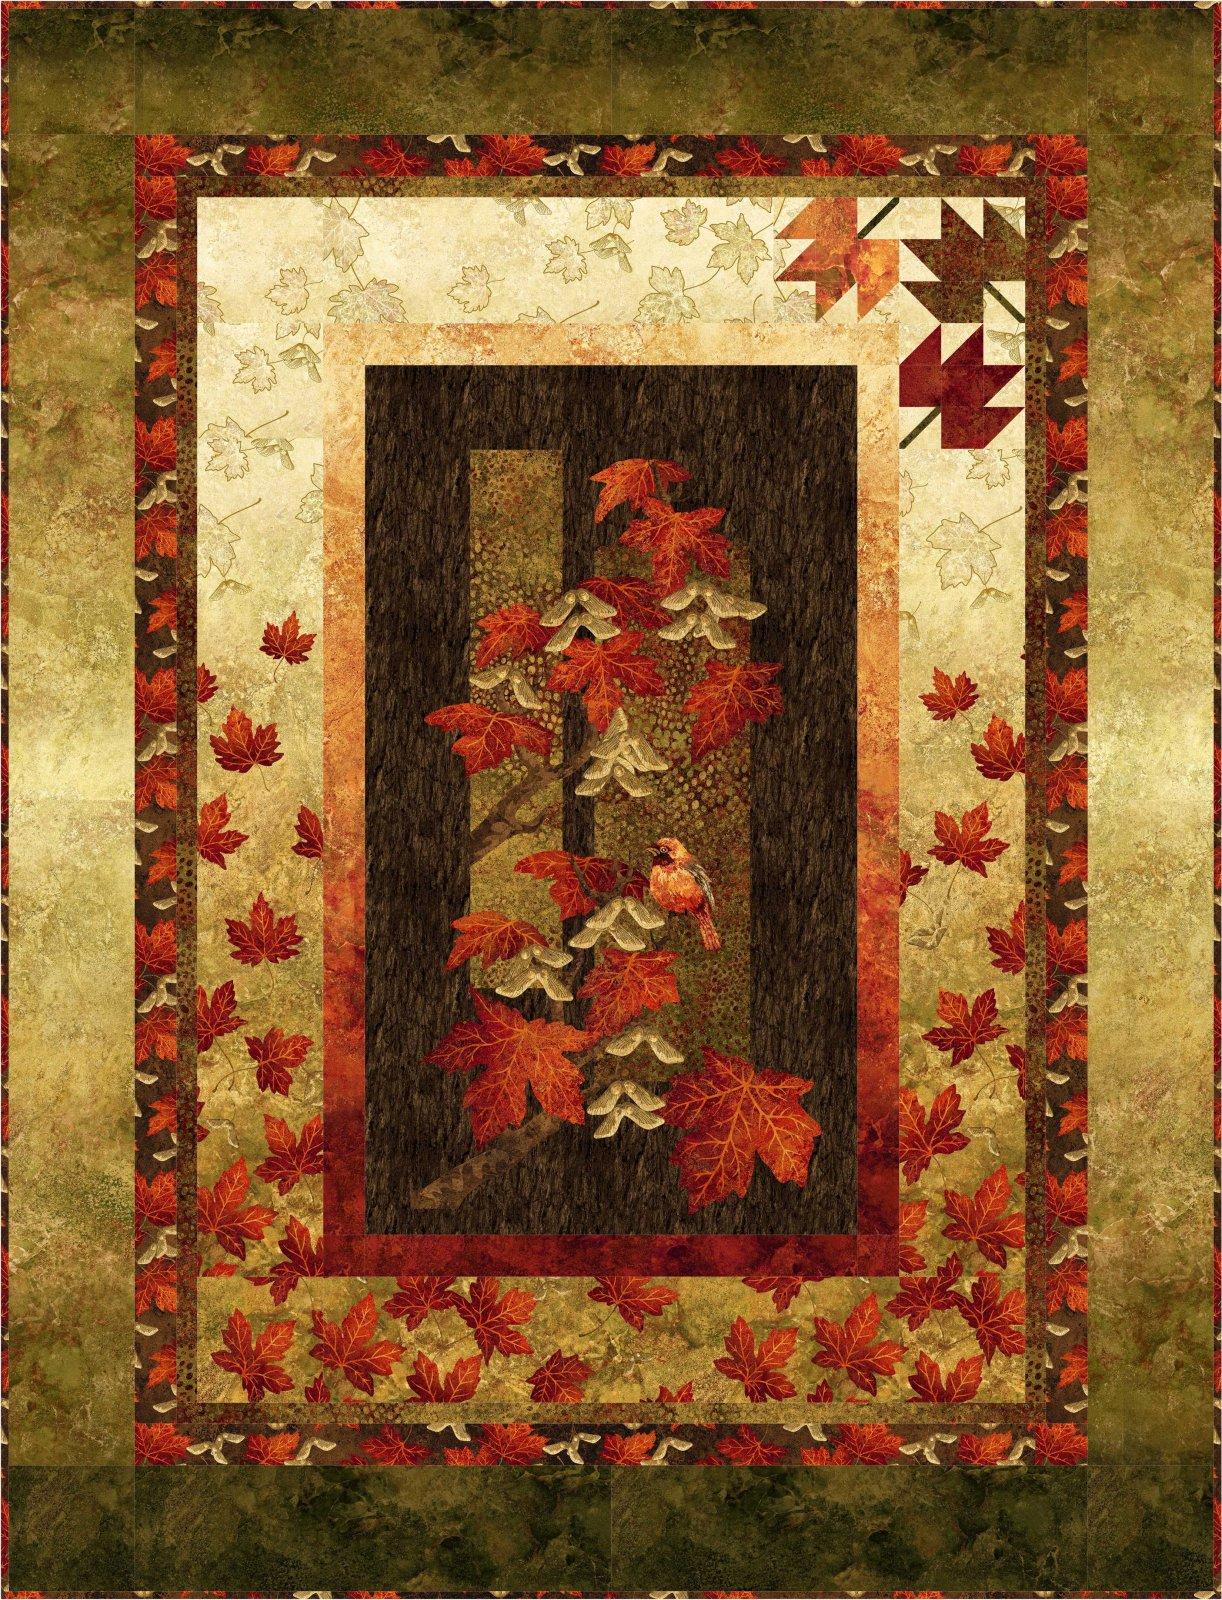 Autumn Splendor quilt pattern